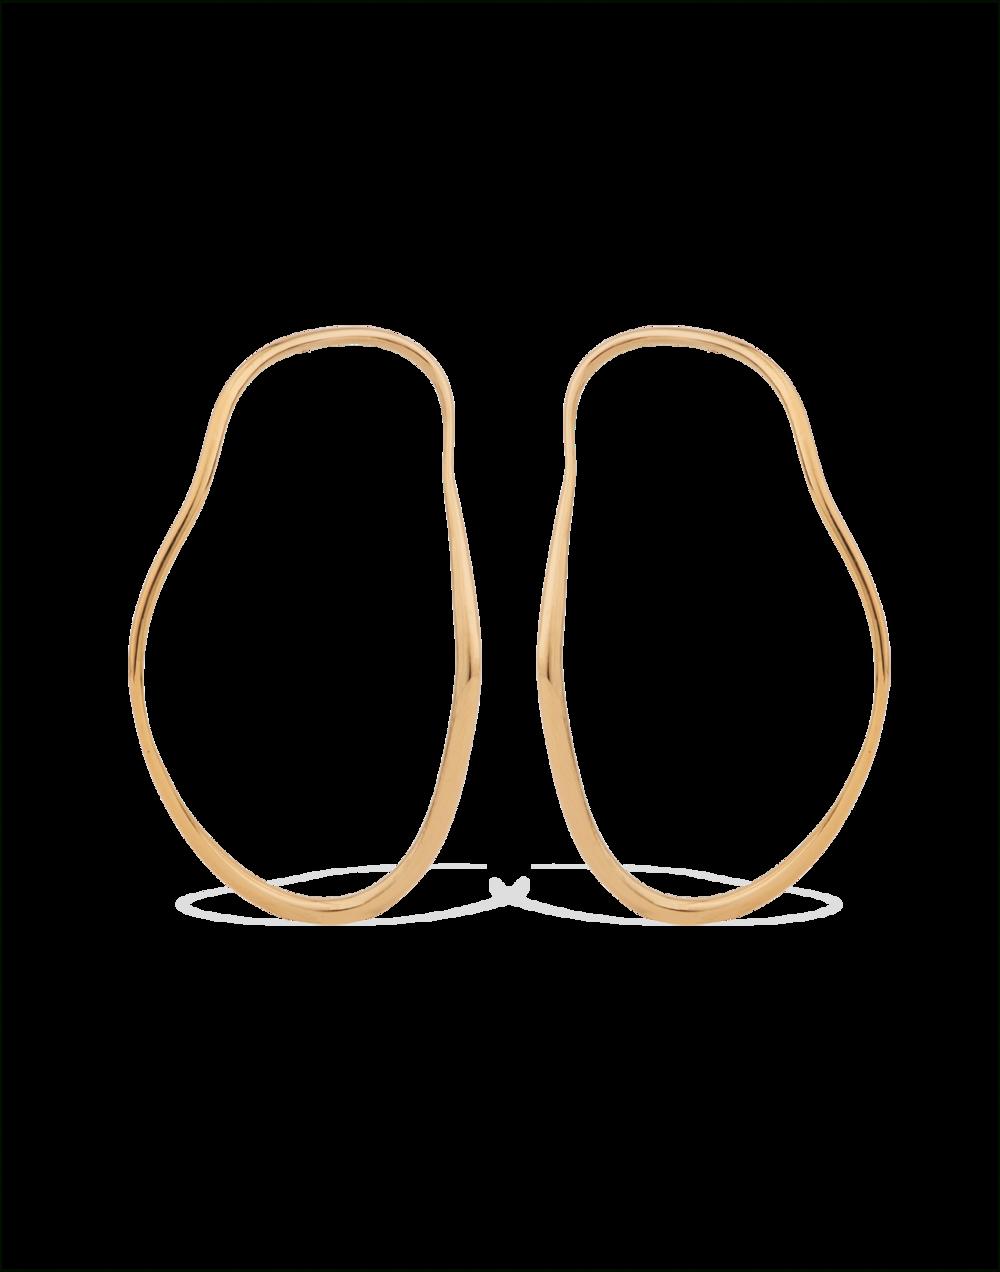 Completedworks-Earrings-Gold-Vermeil-Subcommittees-1-1.png